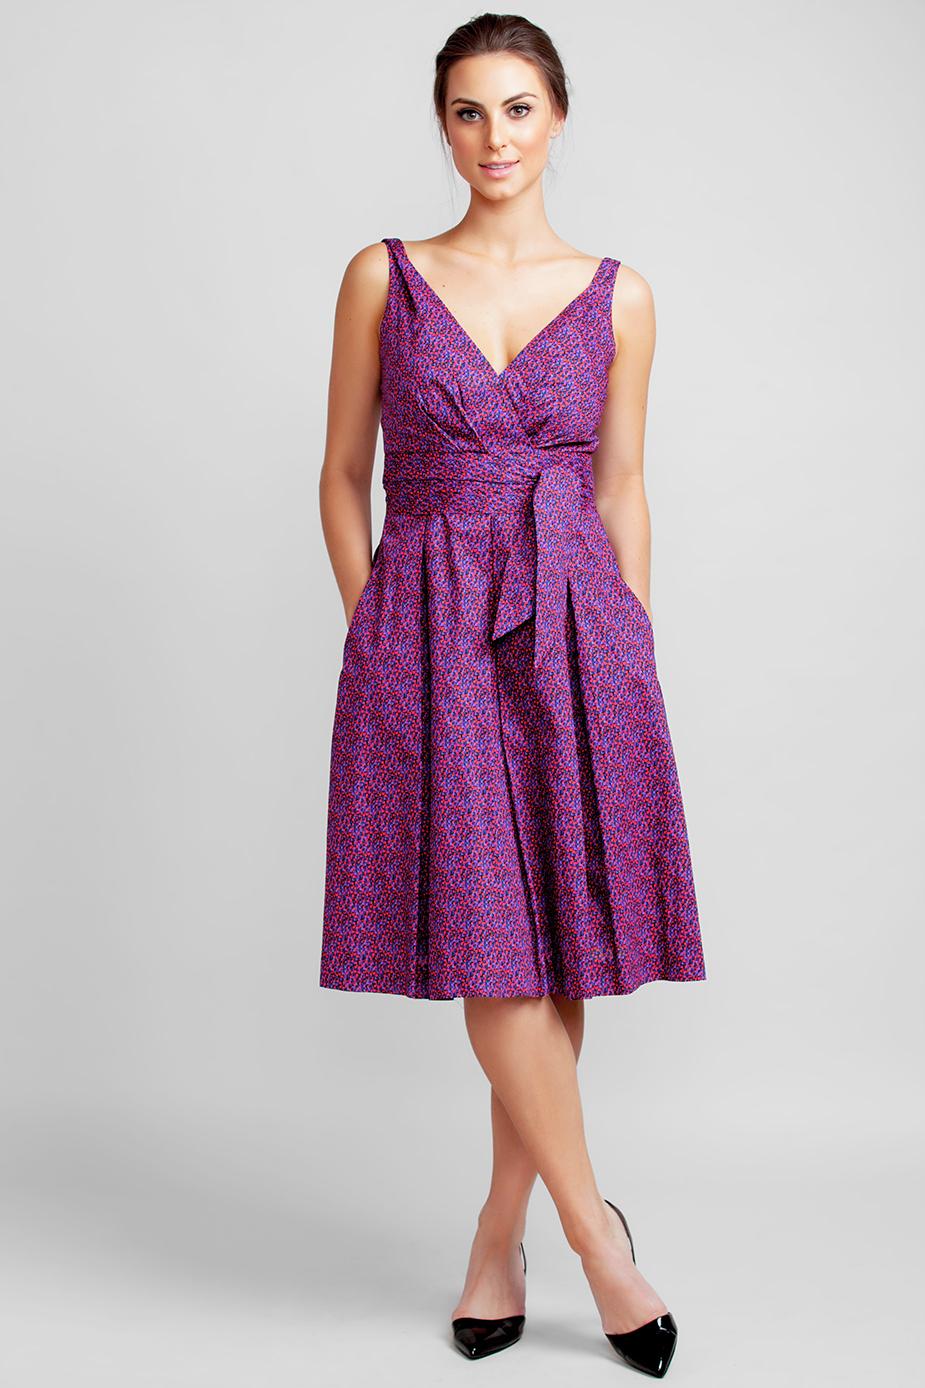 cc353232cf2 Pink Pointillism Garden Party Dress - Suzy Perette New York